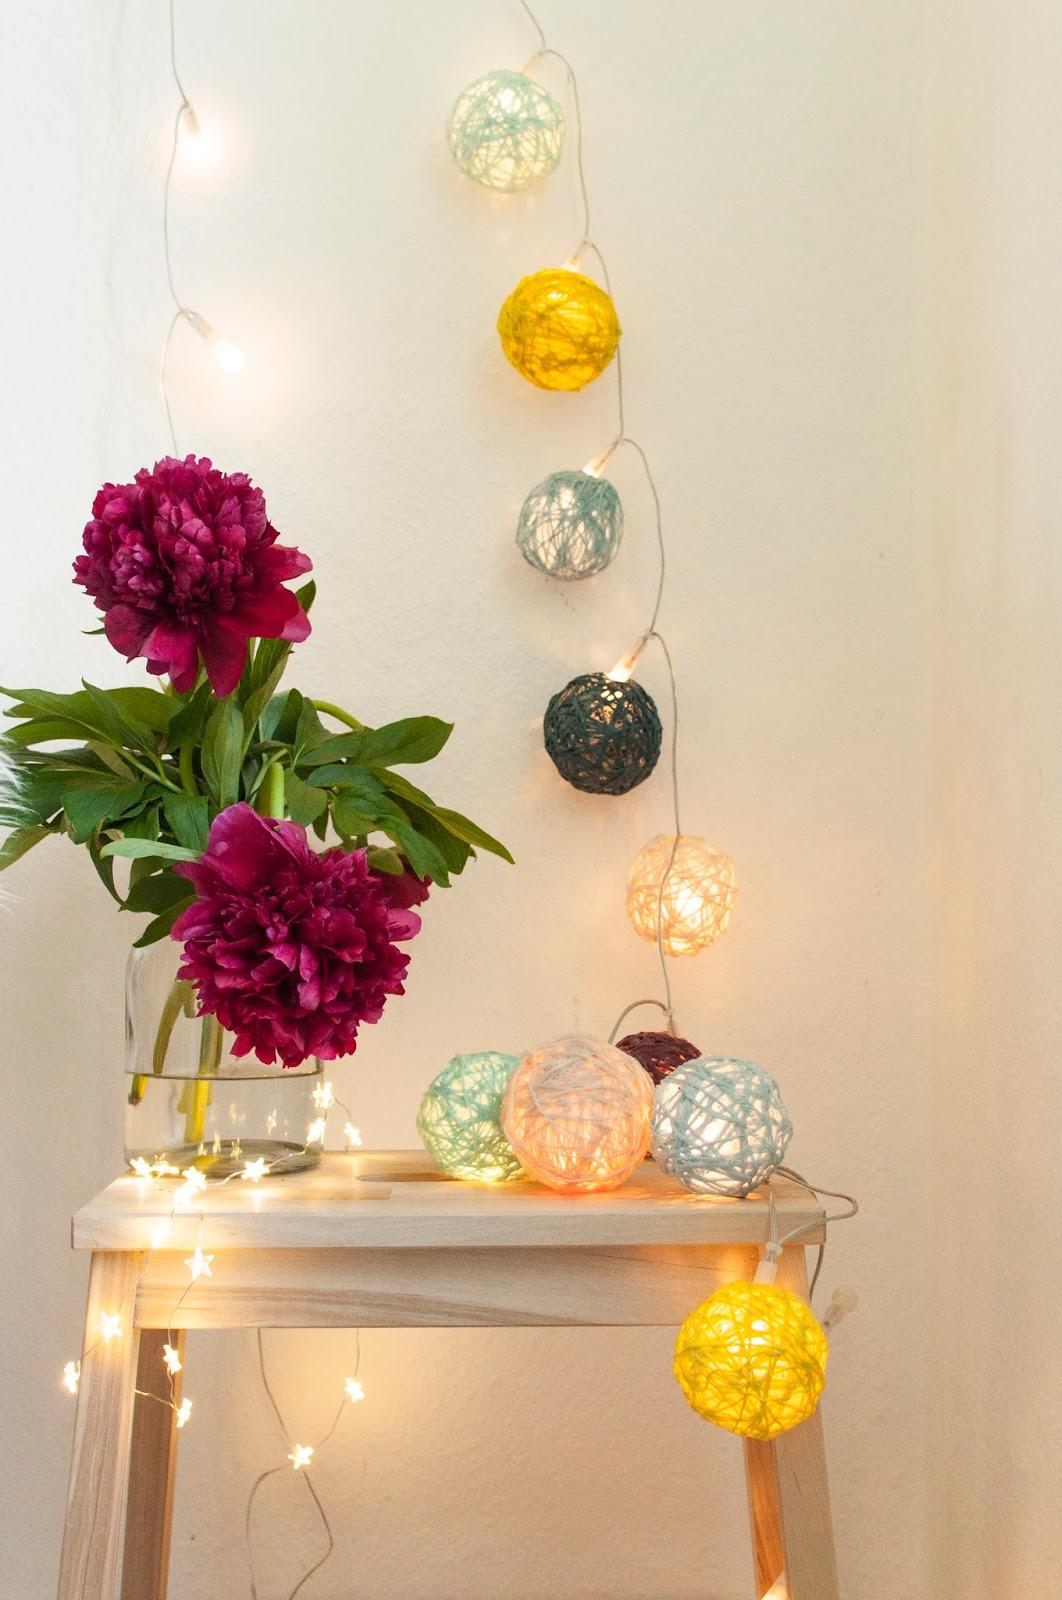 dicke w goldmarie cotton ball lichterkette selbst gemacht. Black Bedroom Furniture Sets. Home Design Ideas